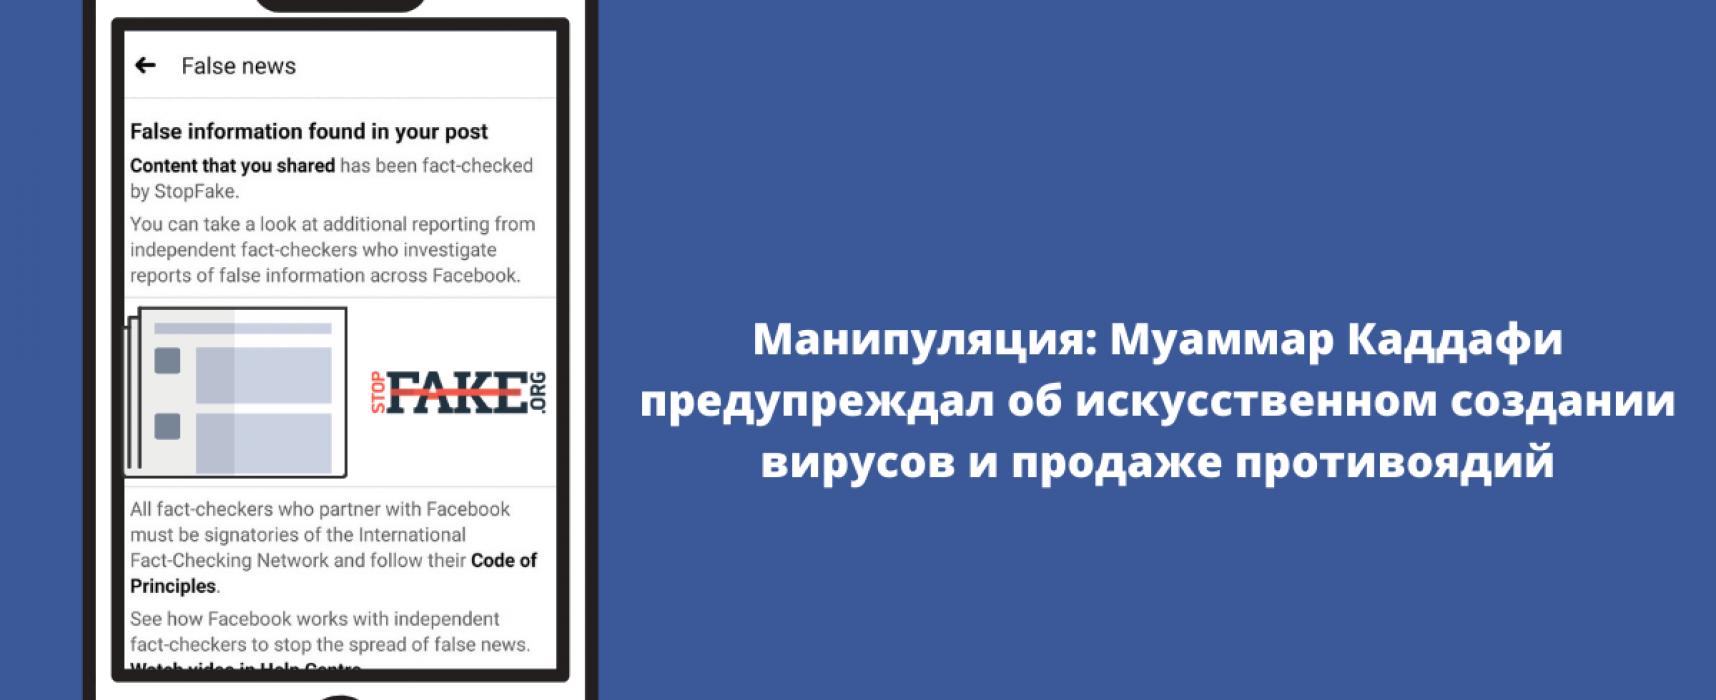 Манипуляция: США ввели санкции против России «за разработку вакцины от COVID-19»